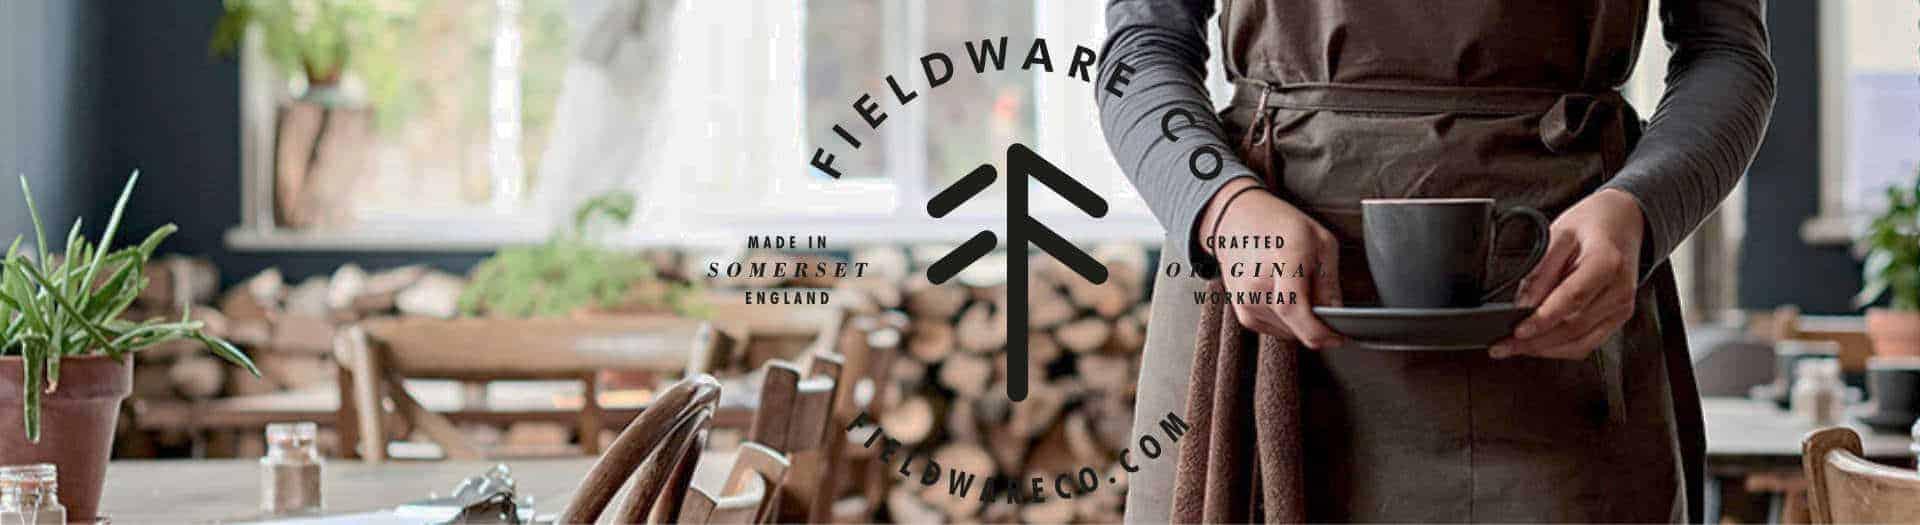 Fieldware co header with logo